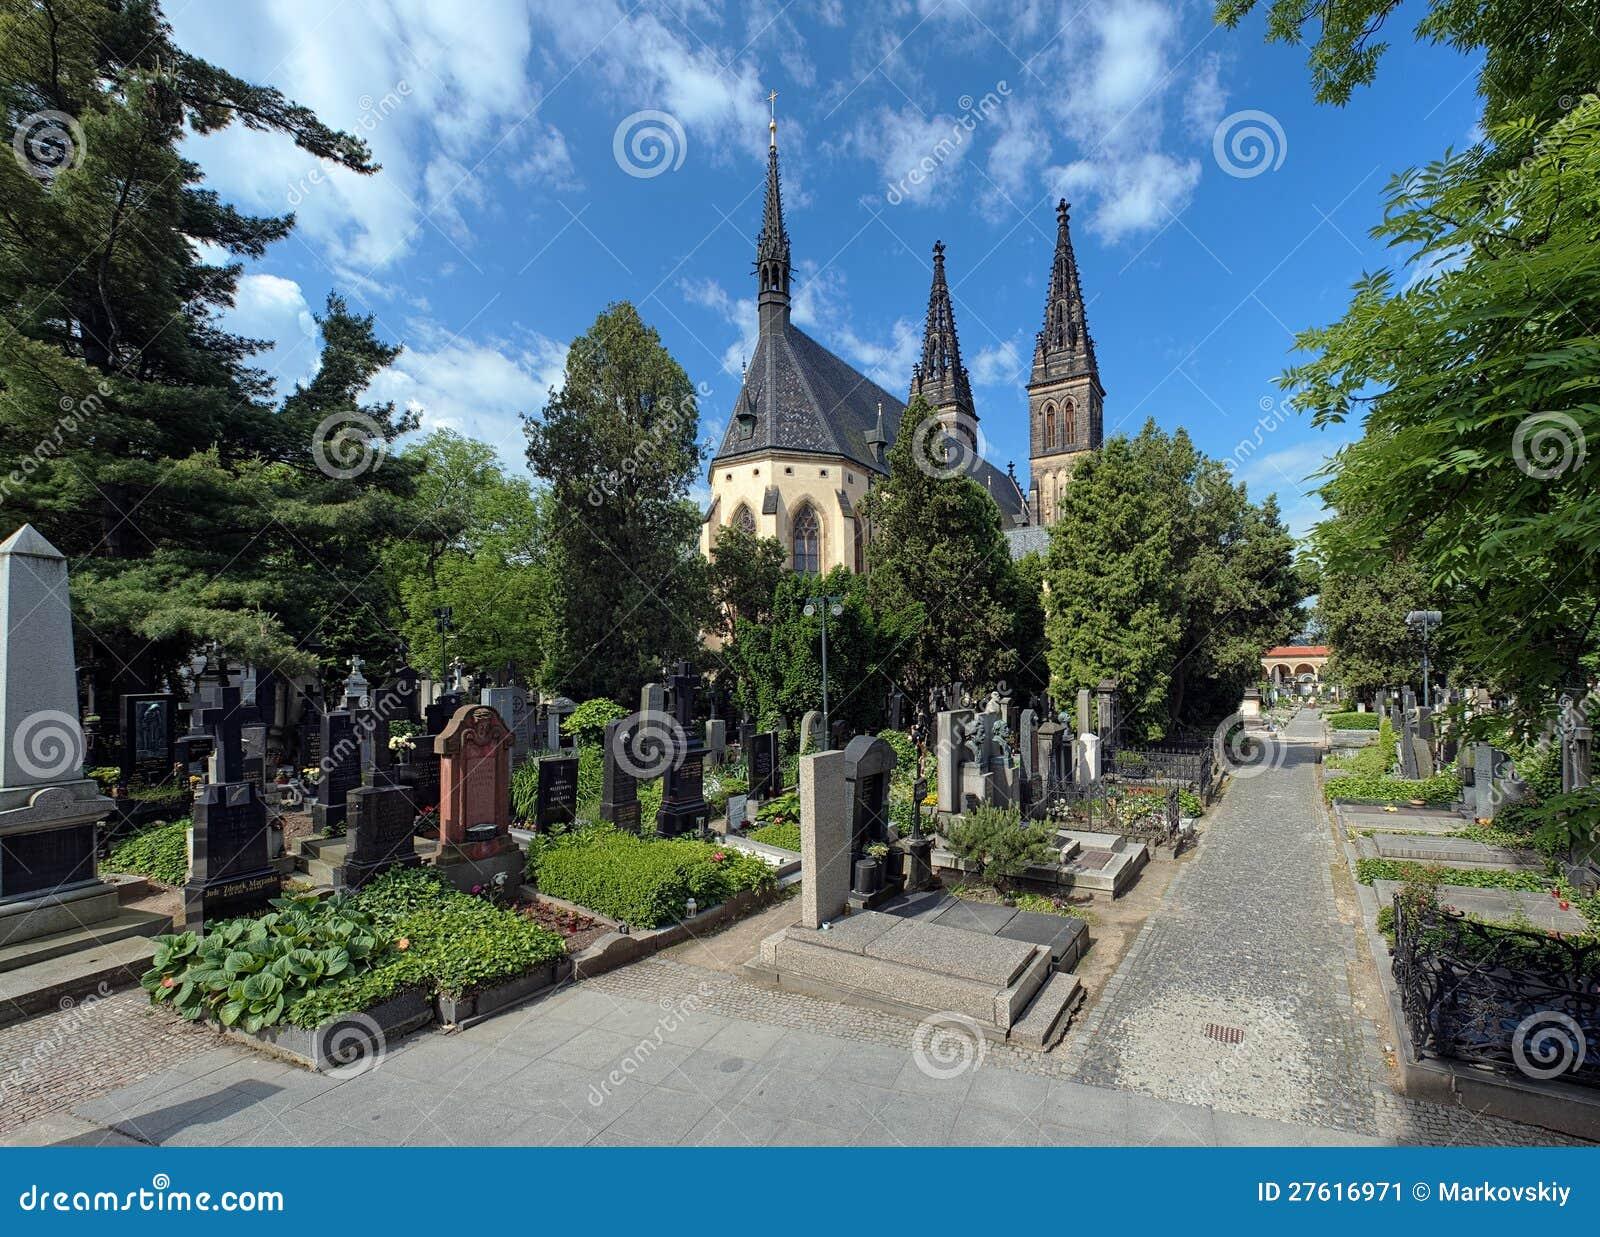 Кладбище в Прага, Чешская Республика Vysehrad